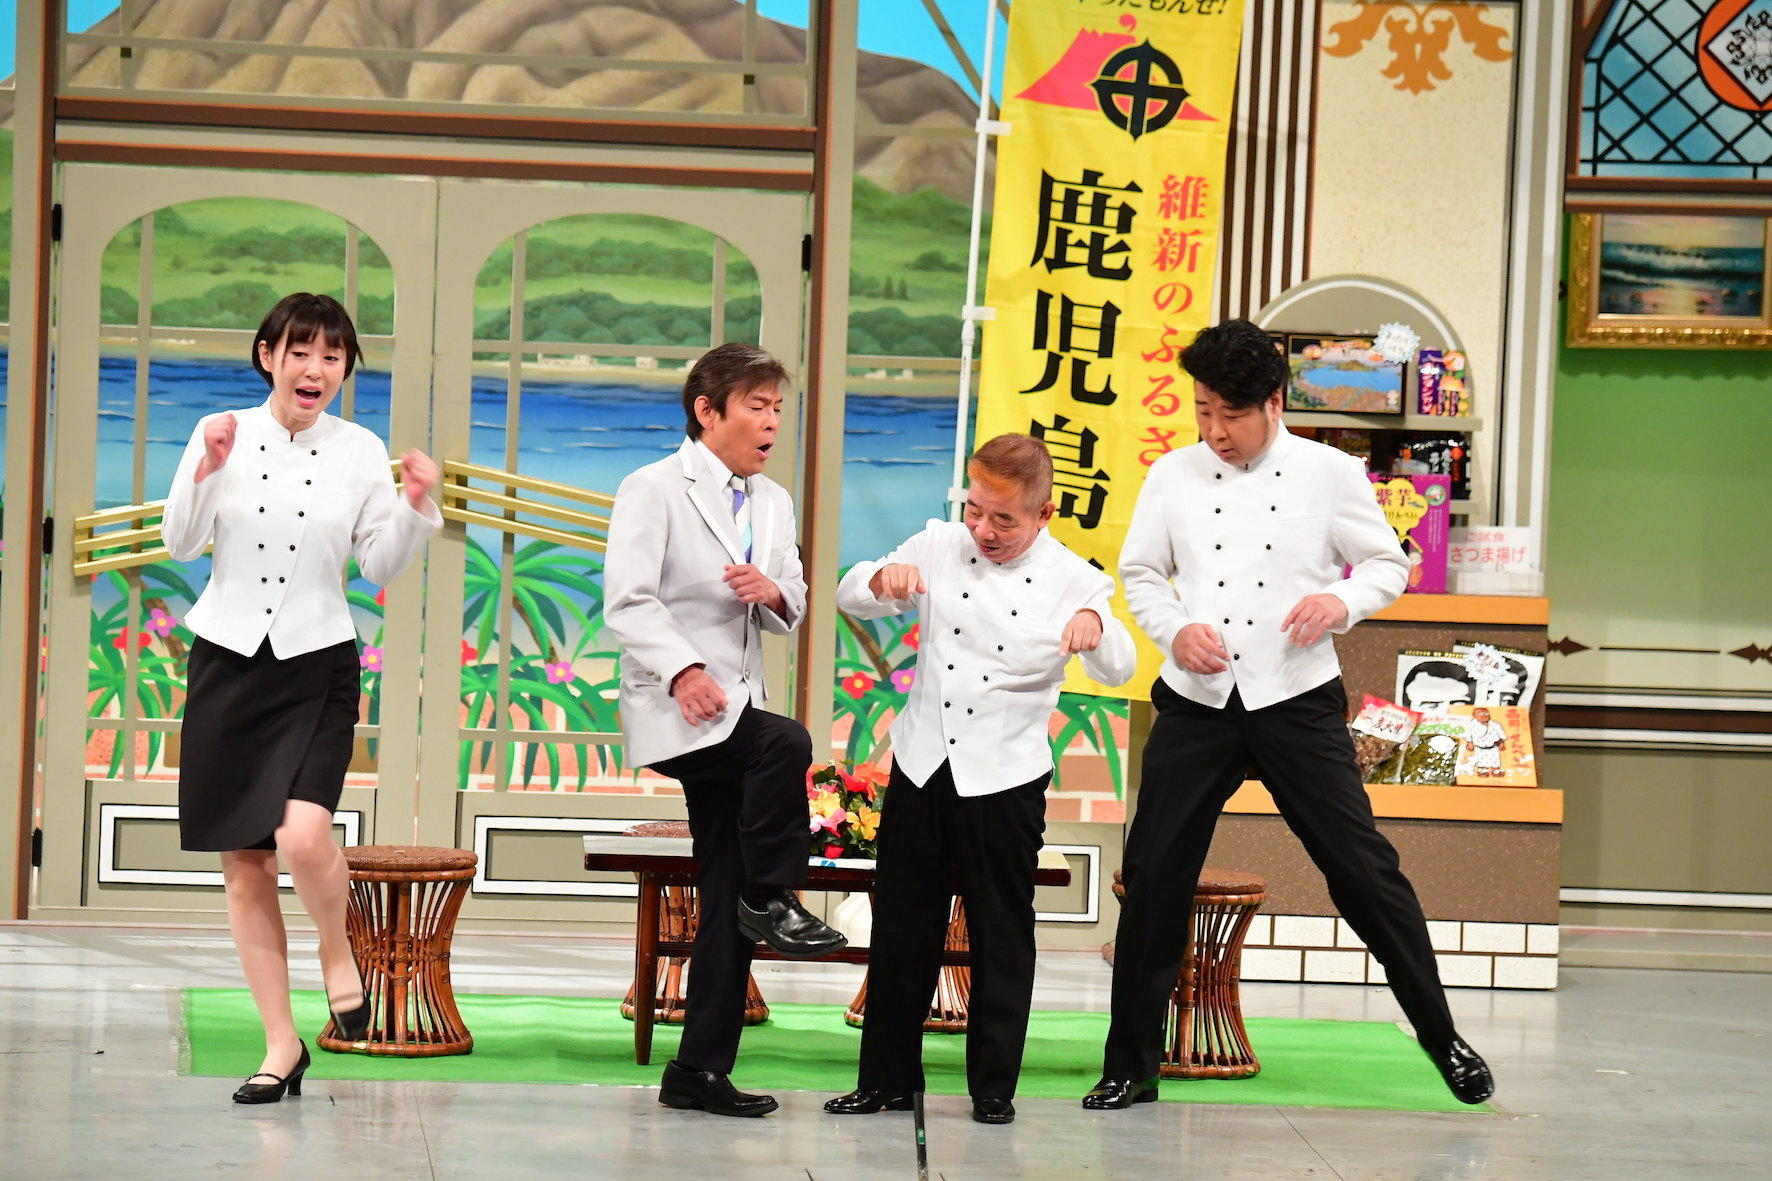 http://news.yoshimoto.co.jp/20180720185806-7a5177631b2c15c7a55b6f2791147cae94b7e67e.jpg